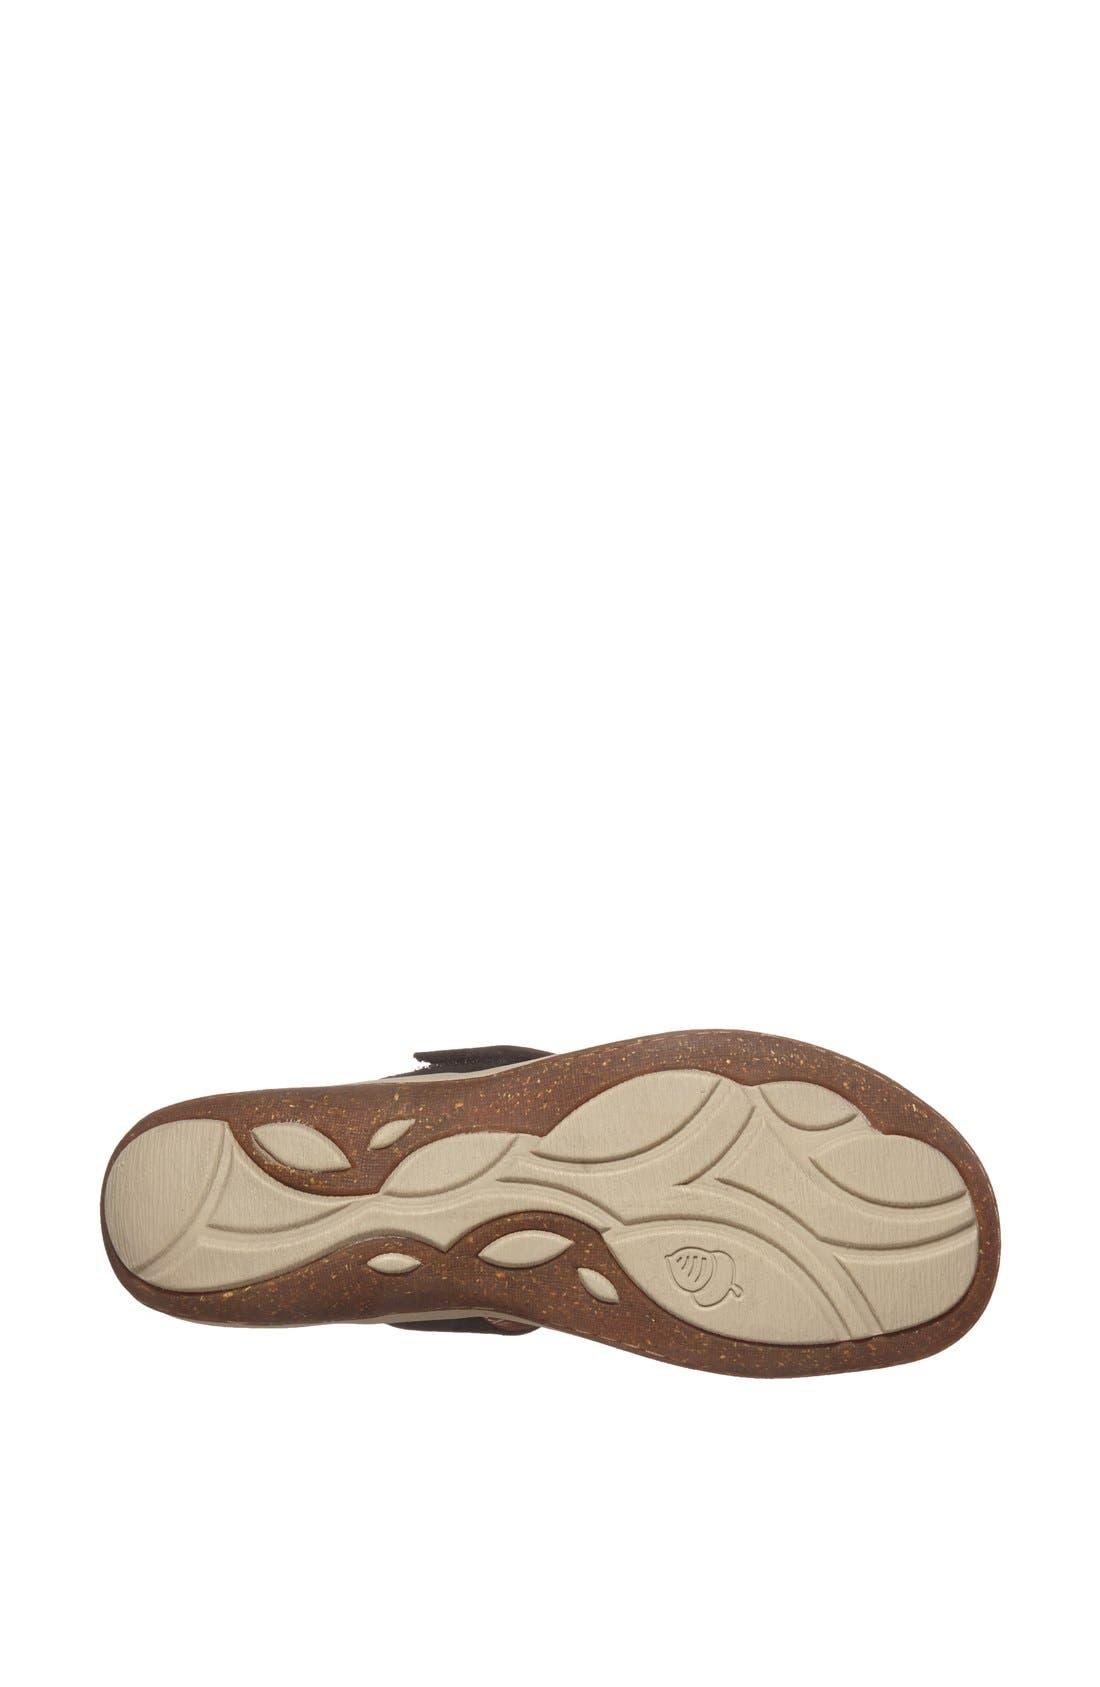 Alternate Image 3  - Acorn 'Vista' Beaded Thong Sandal